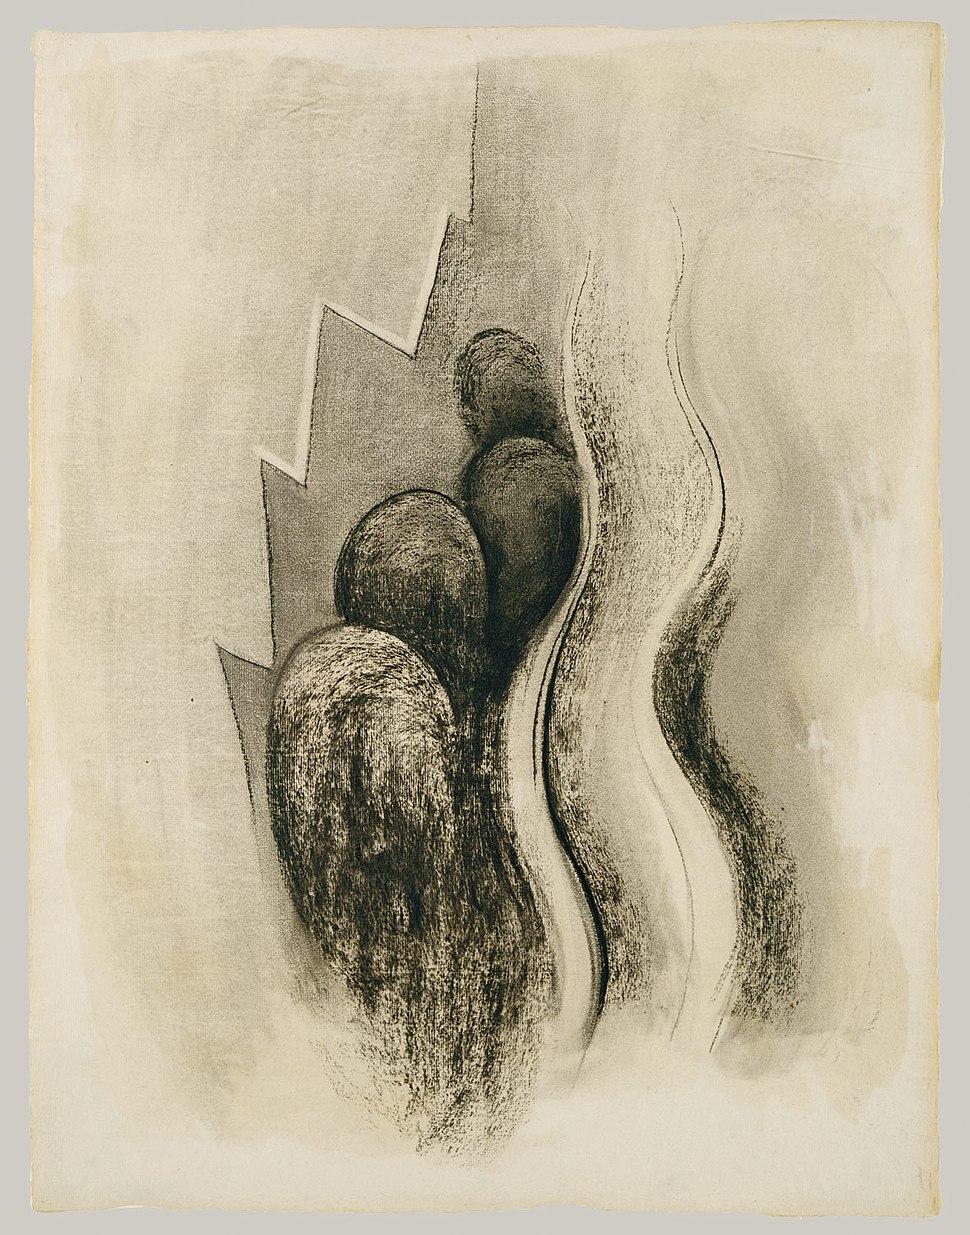 Drawing XIII by Georgia O'Keeffe 1915